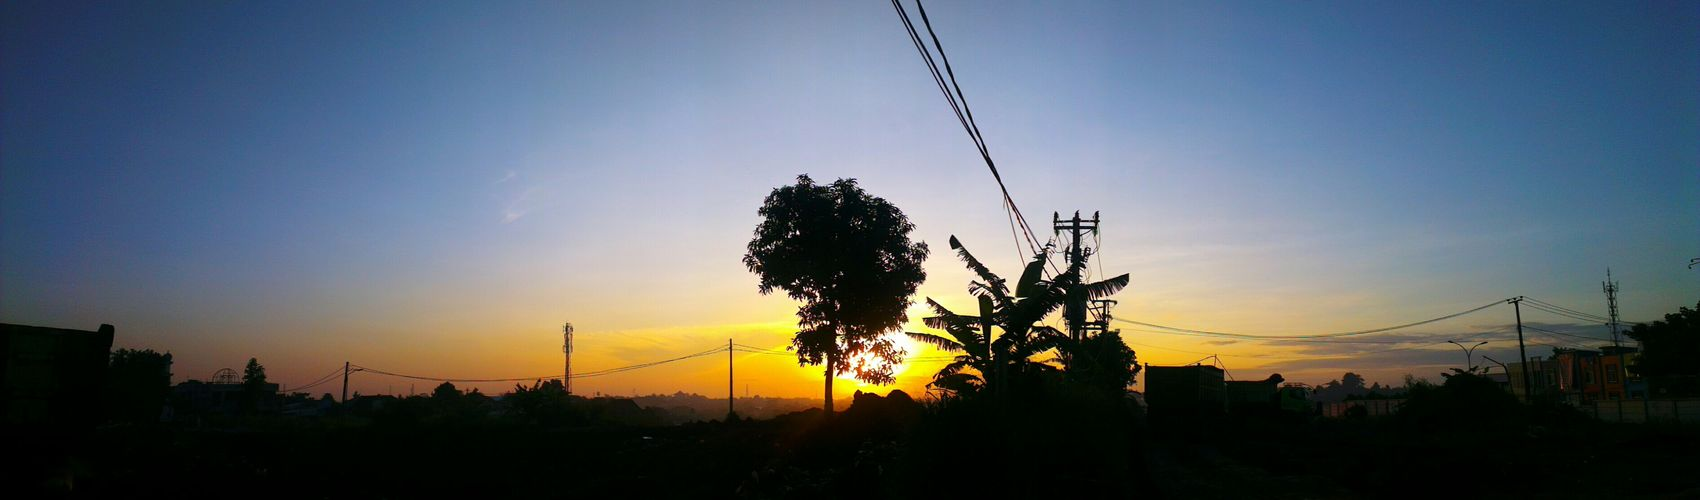 Morning bliss Sunrise Sunrise_Collection Landscape Panoramic Photography PhonePhotography HTC_photography Indonesia_allshots INDONESIA Sillouette